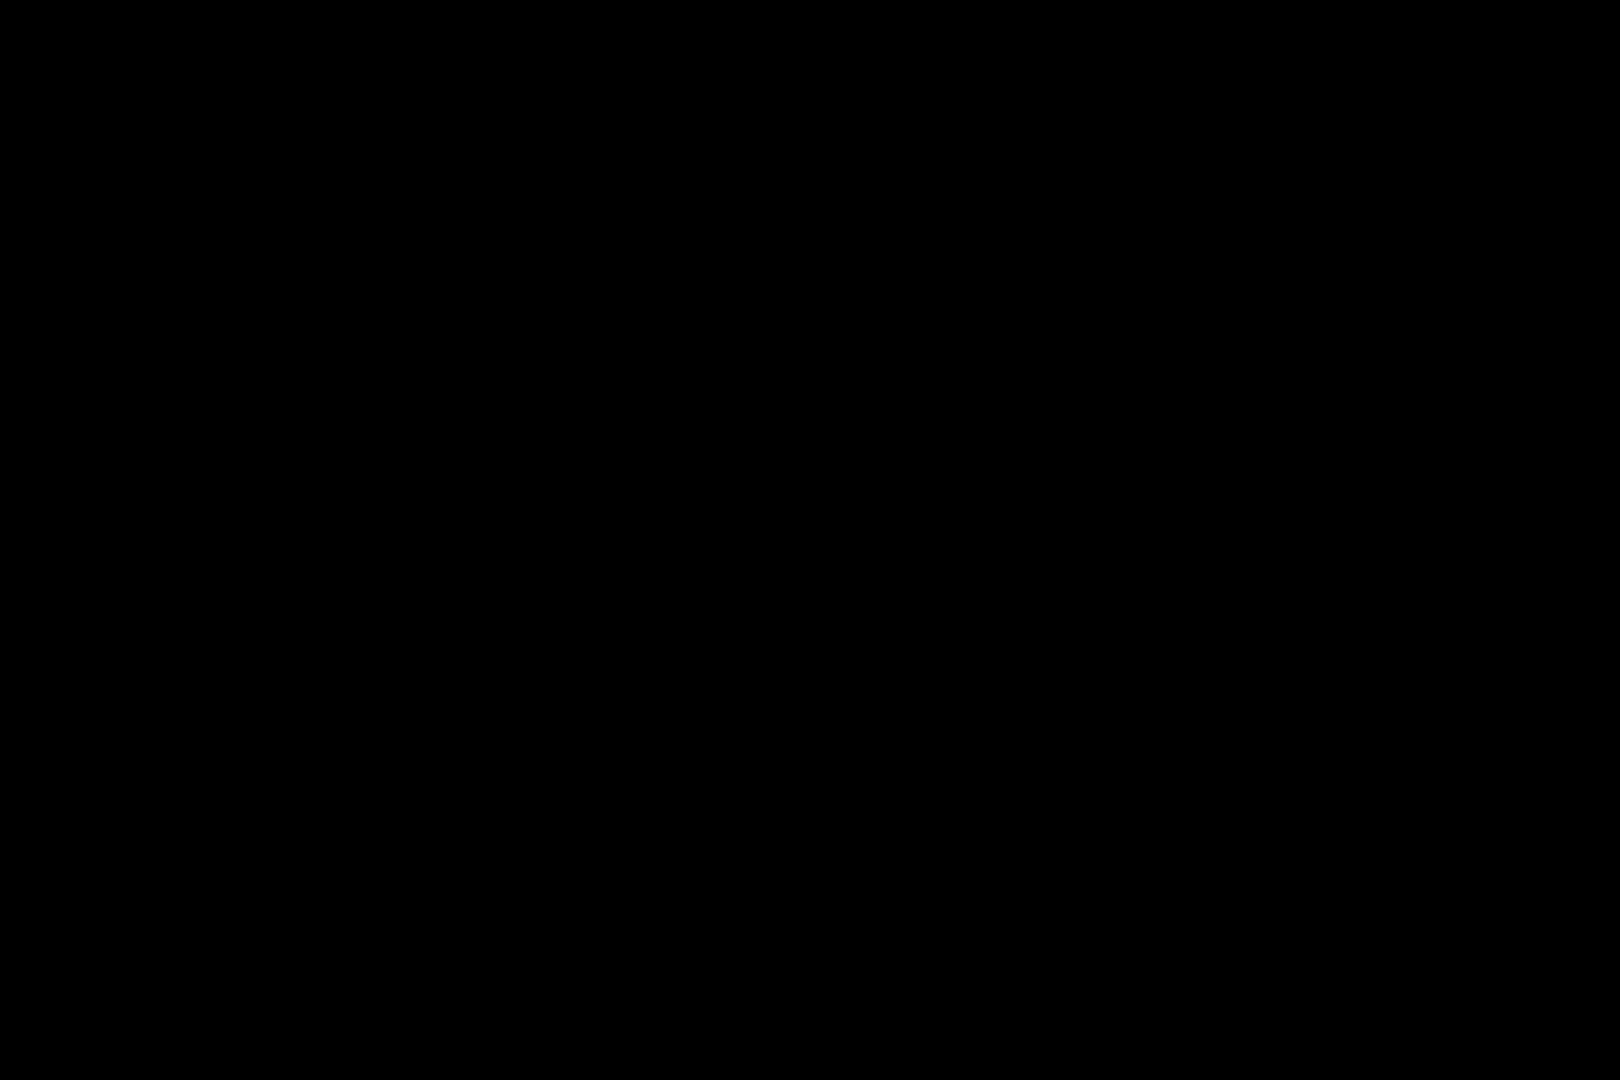 充血監督の深夜の運動会Vol.27 OLヌード天国 性交動画流出 63PIX 56